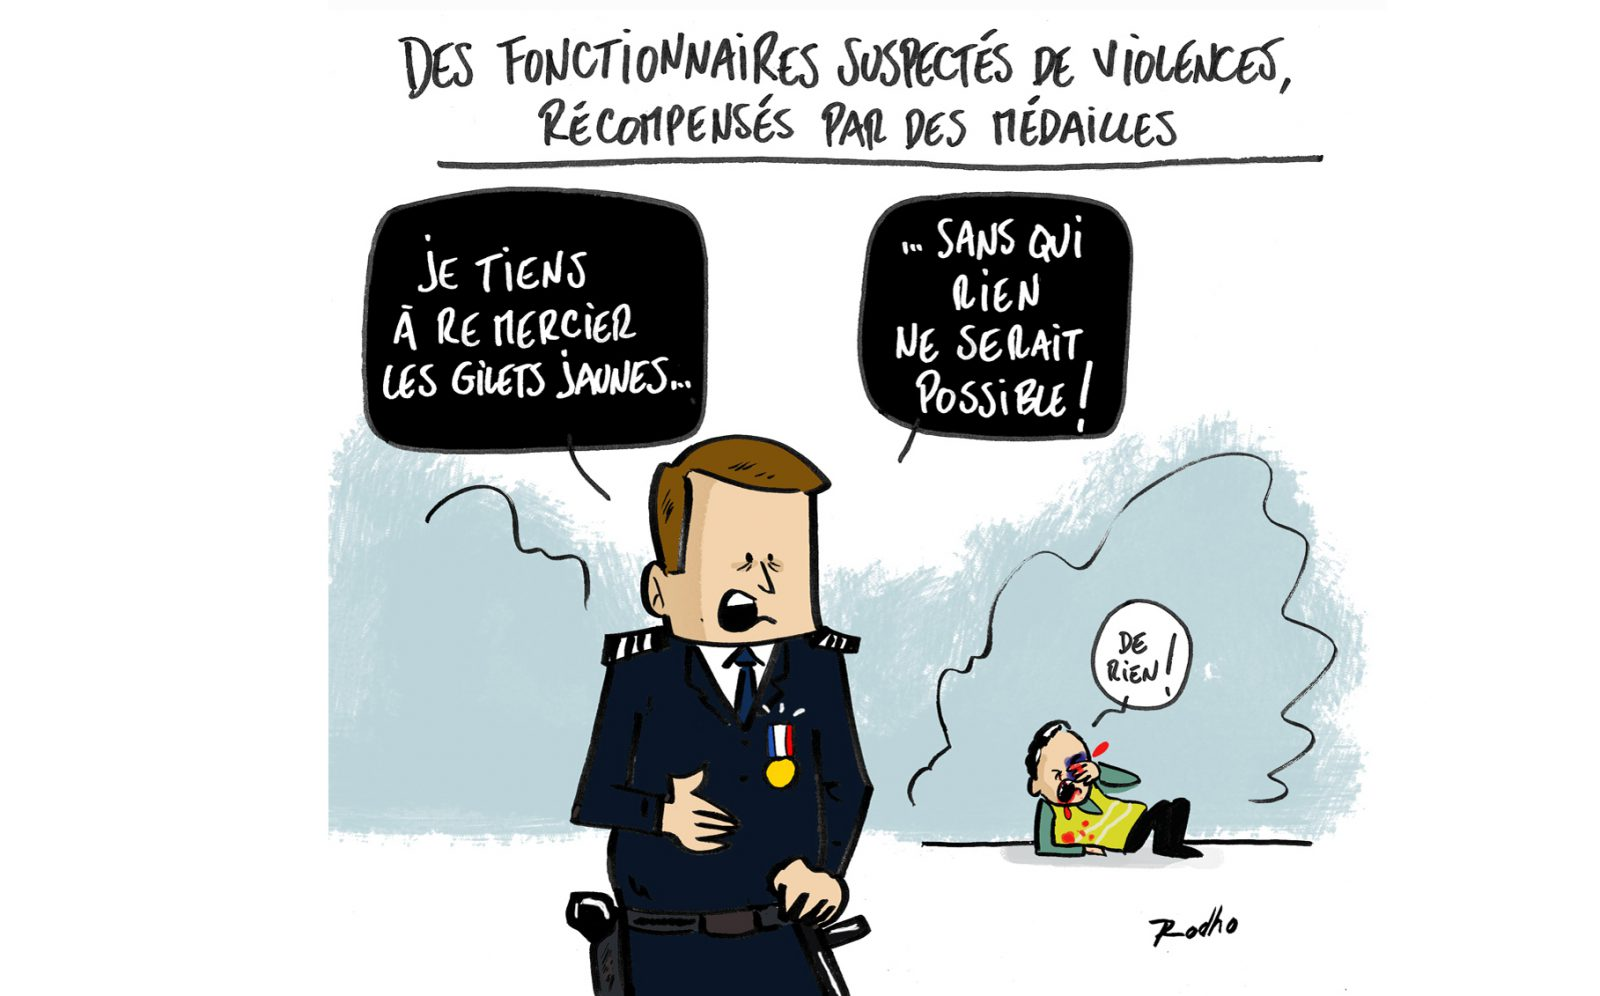 medailles-violence-police